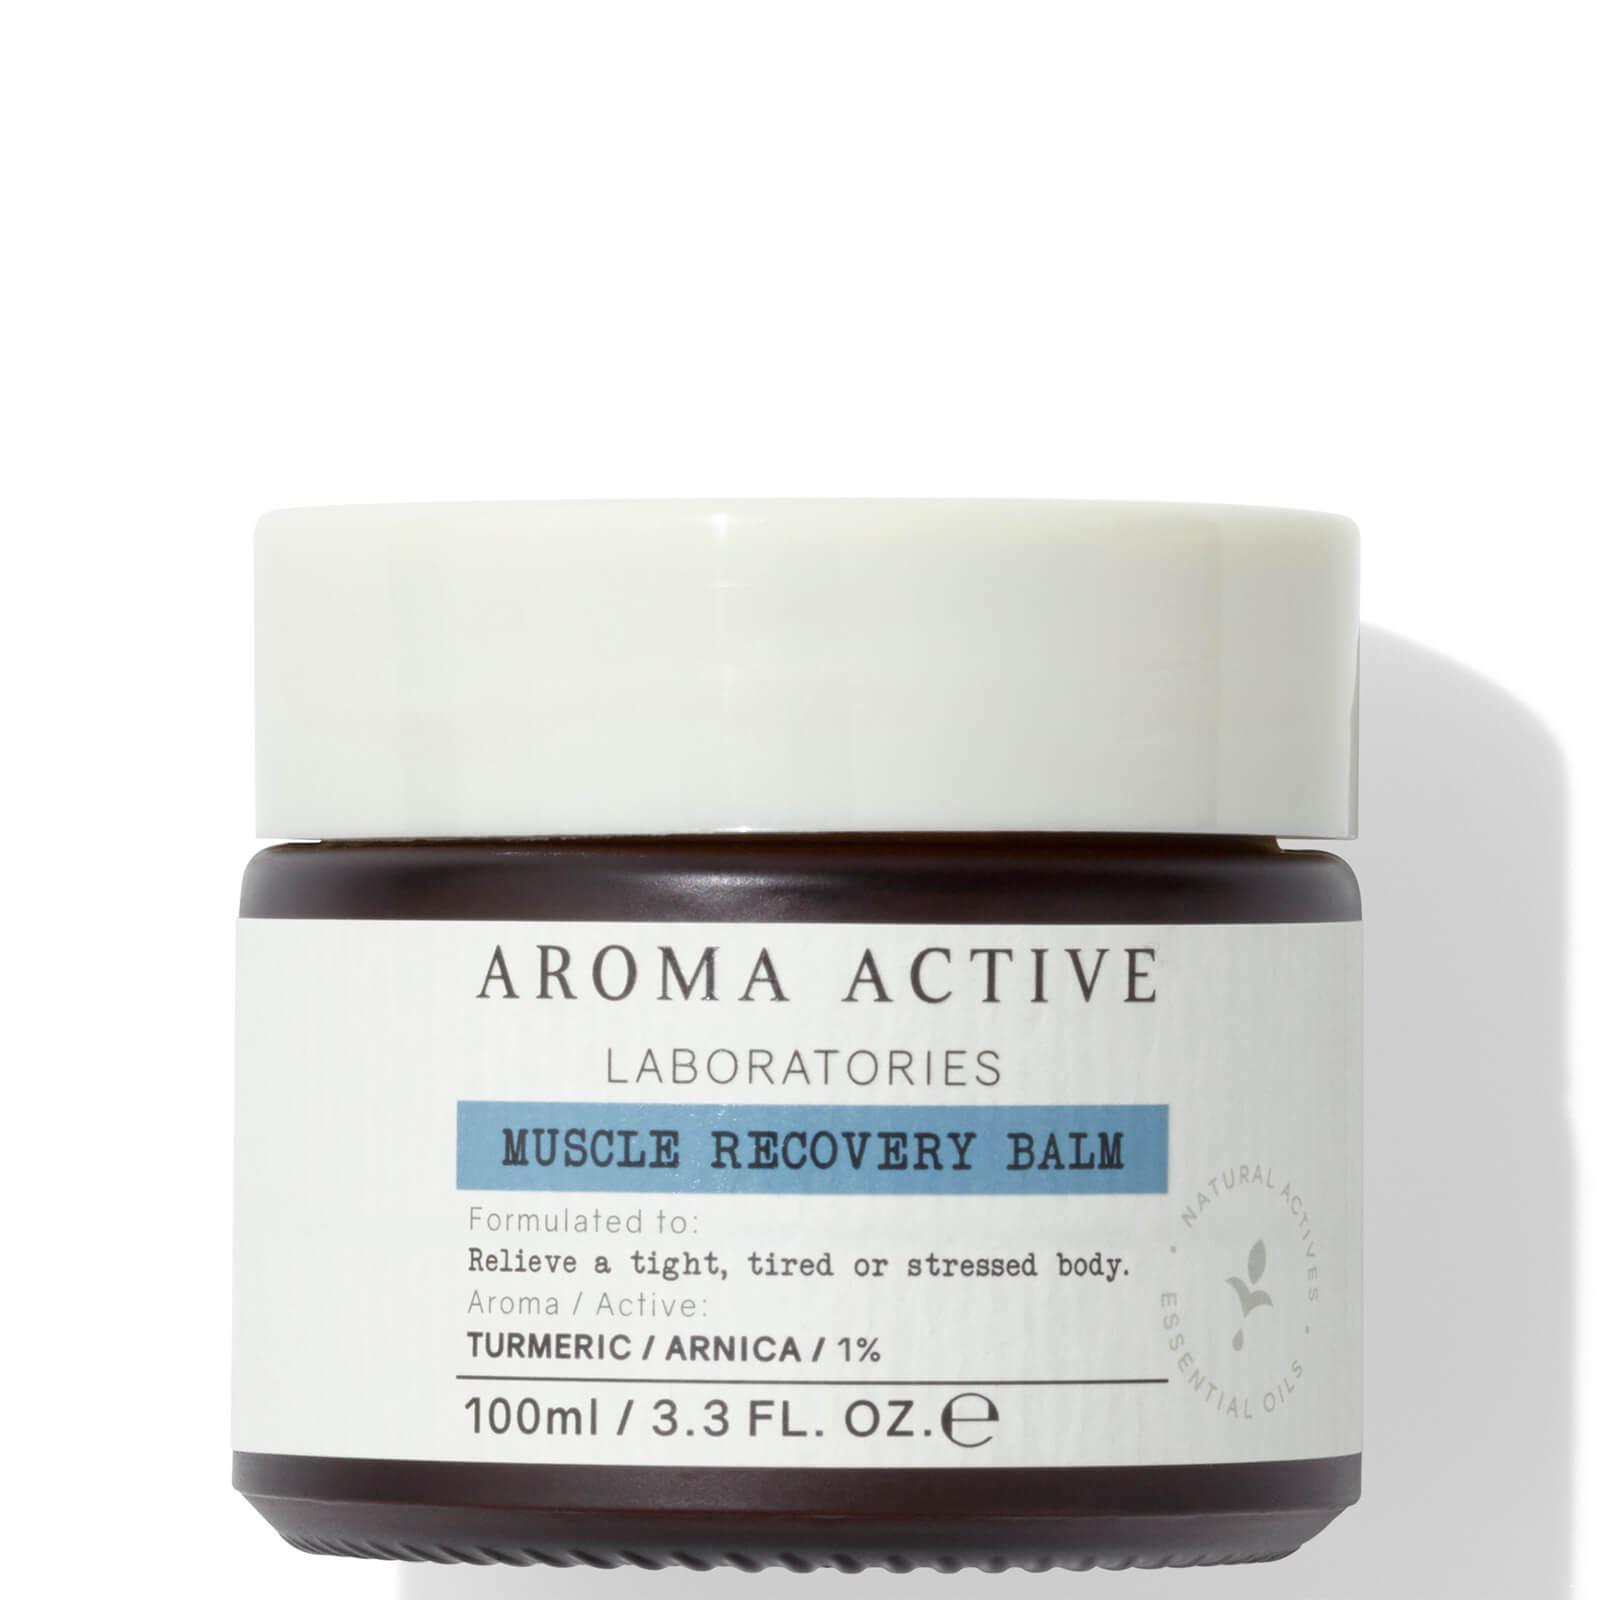 Купить Aroma Active Muscle Recovery Balm 100ml